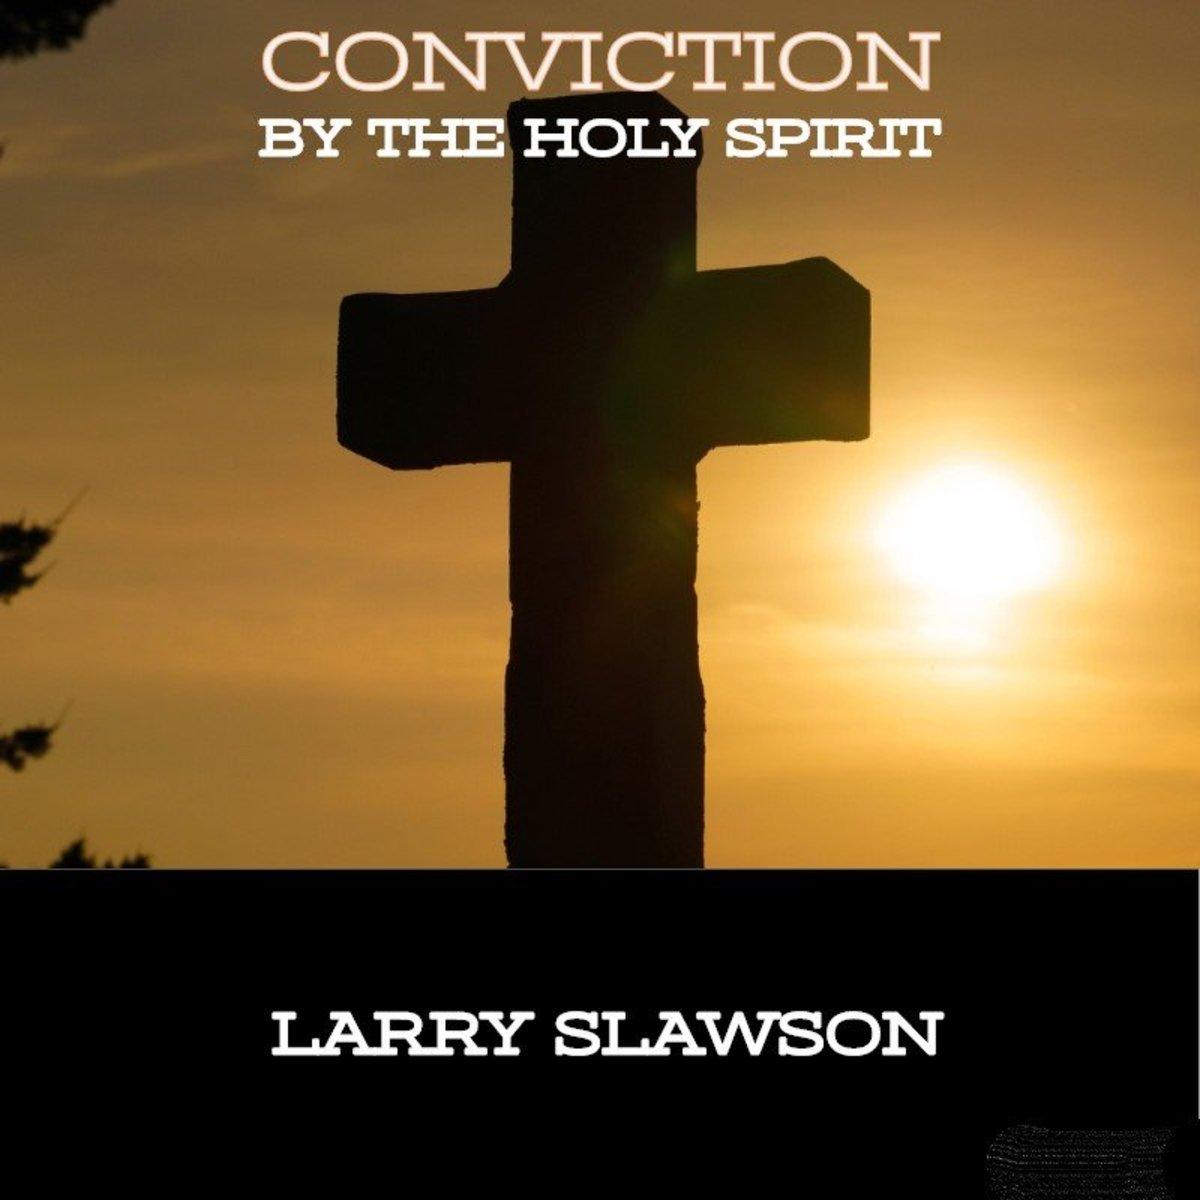 Holy Spirit conviction.